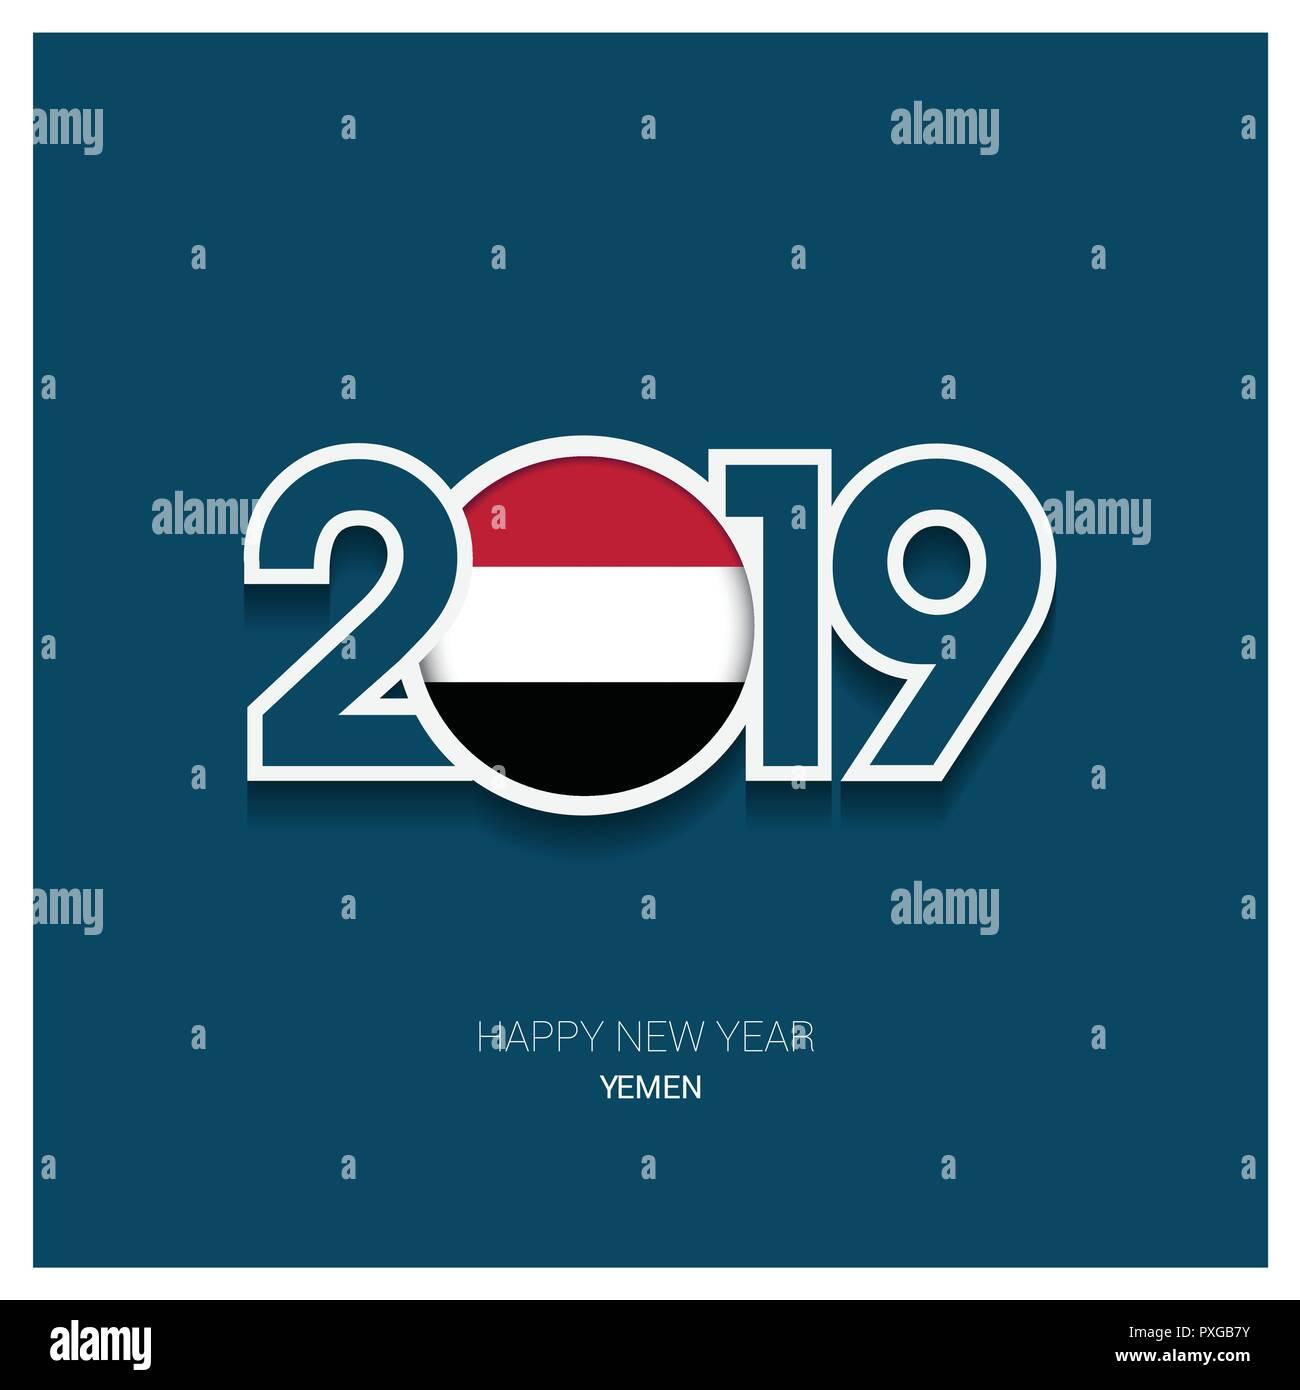 2019 Yemen Typography, Happy New Year Background - Stock Image